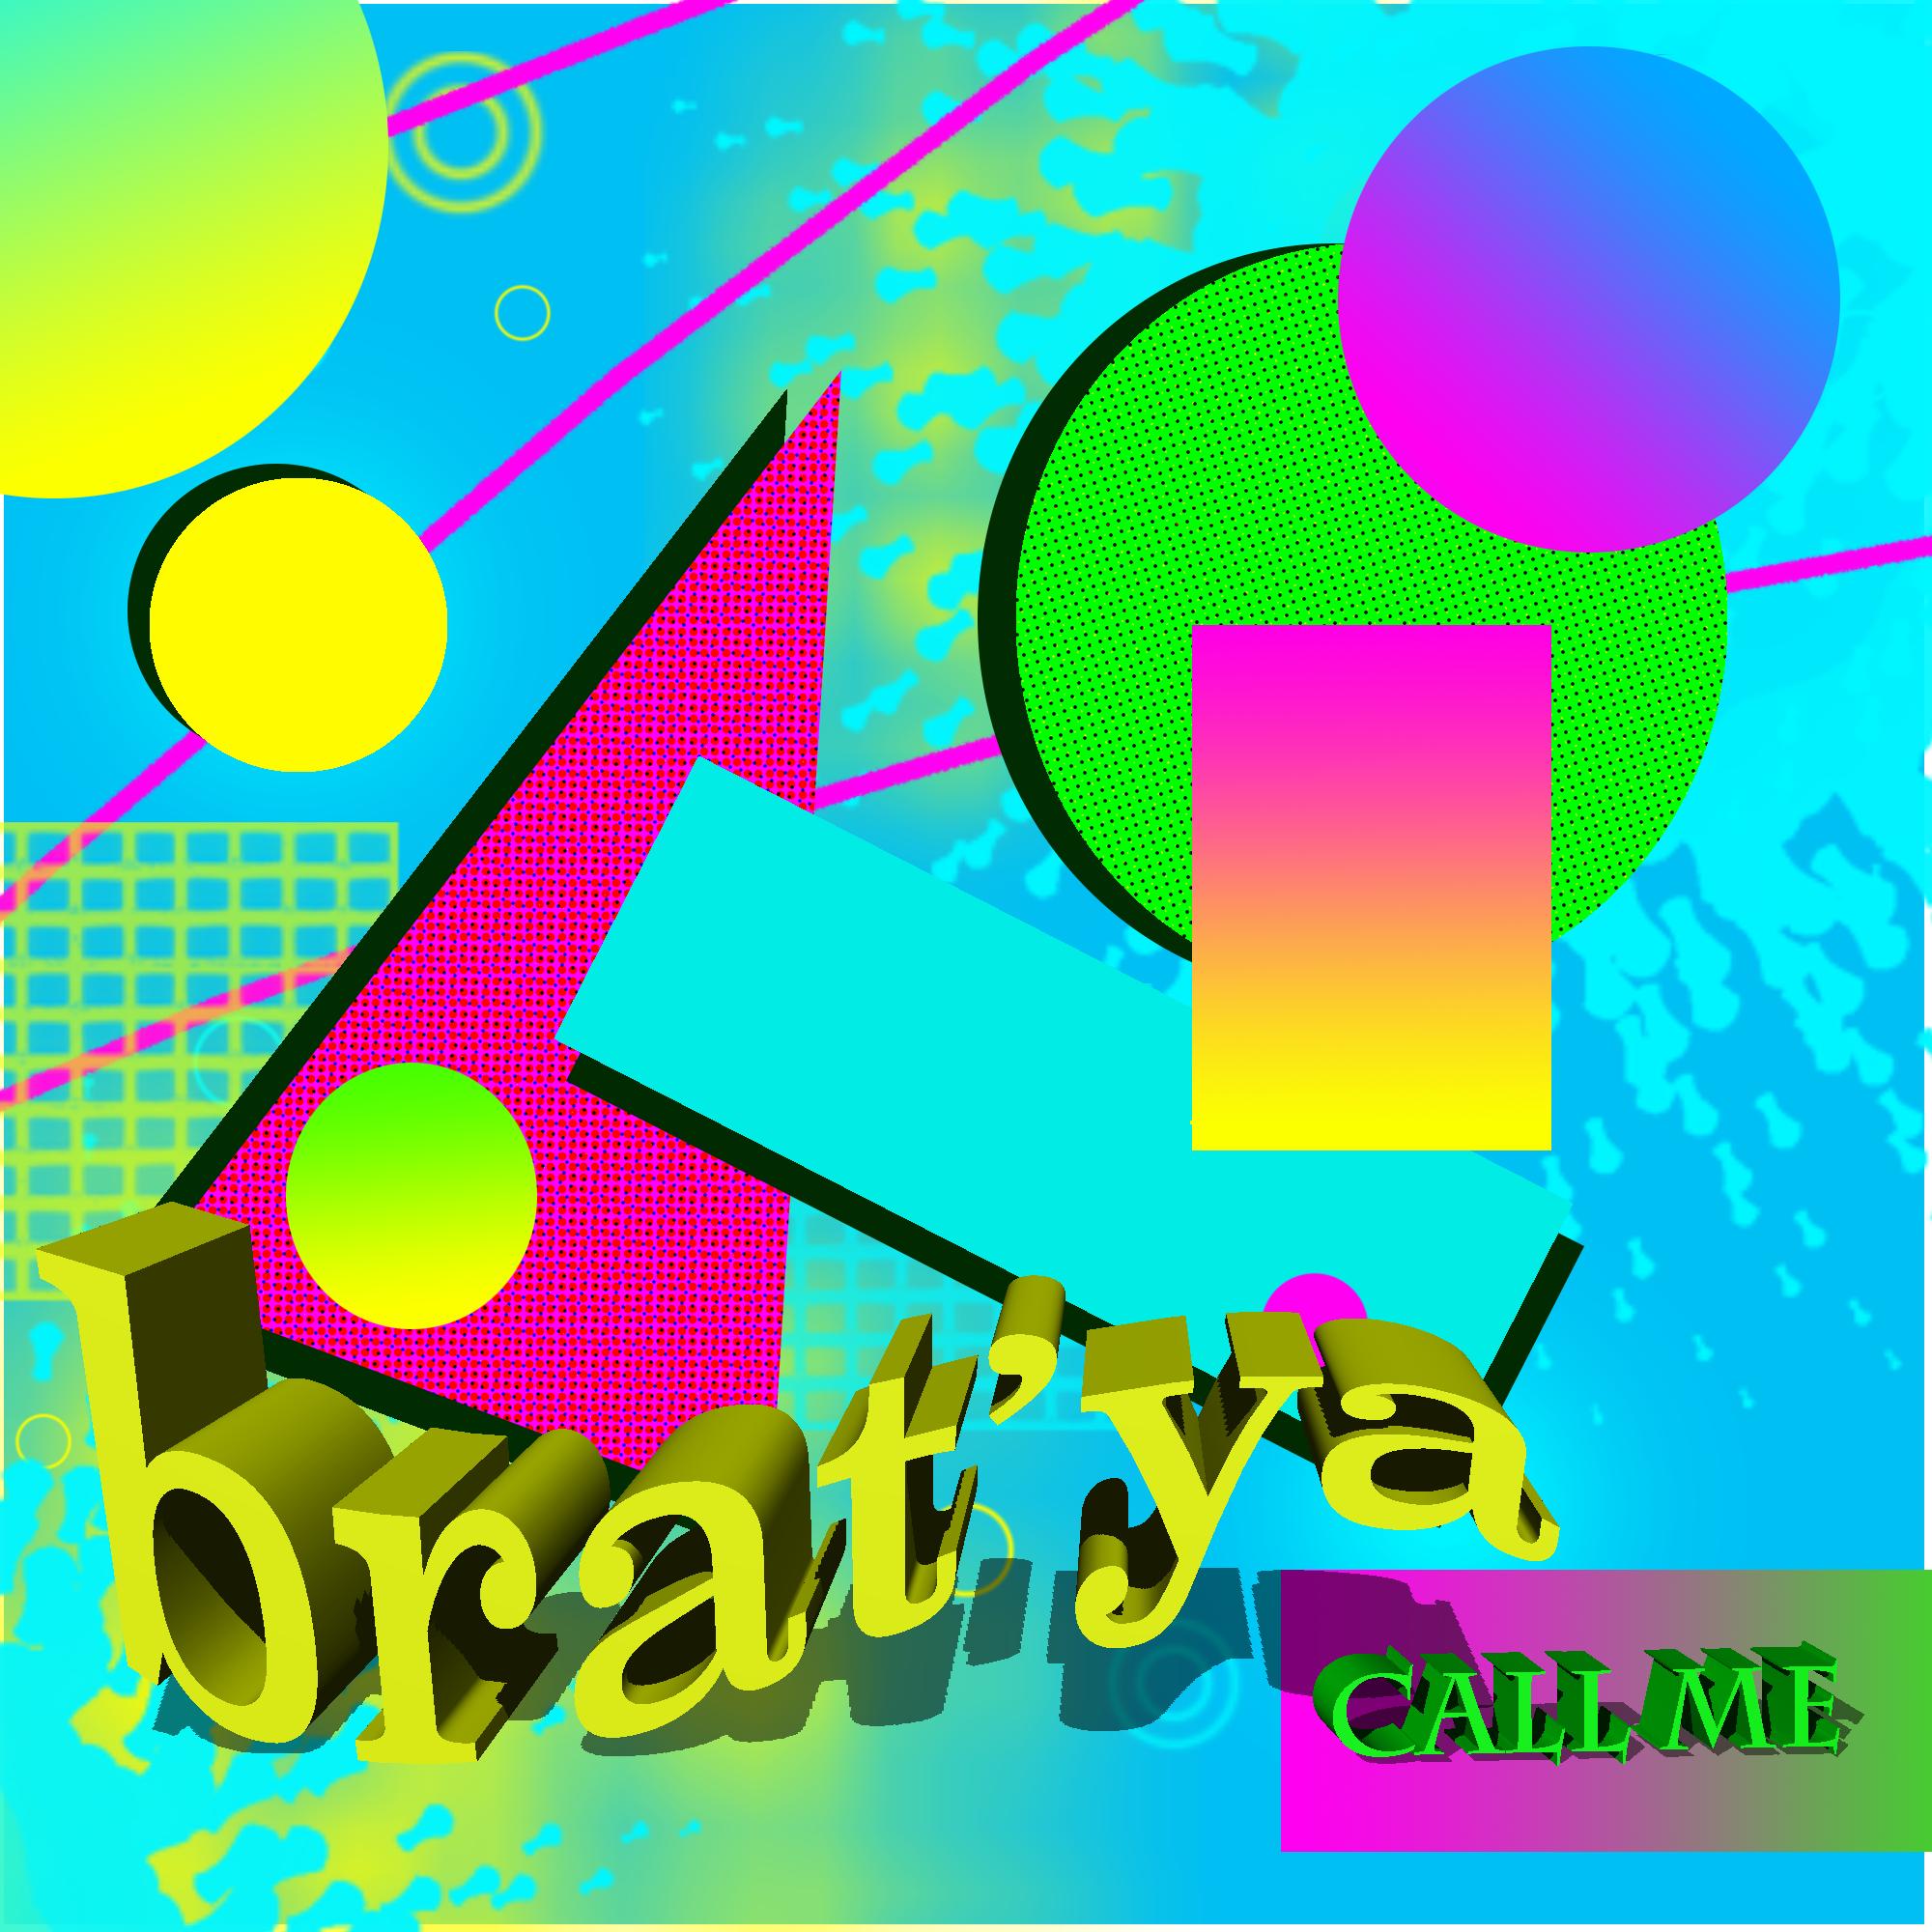 Brat'ya –  Call Me